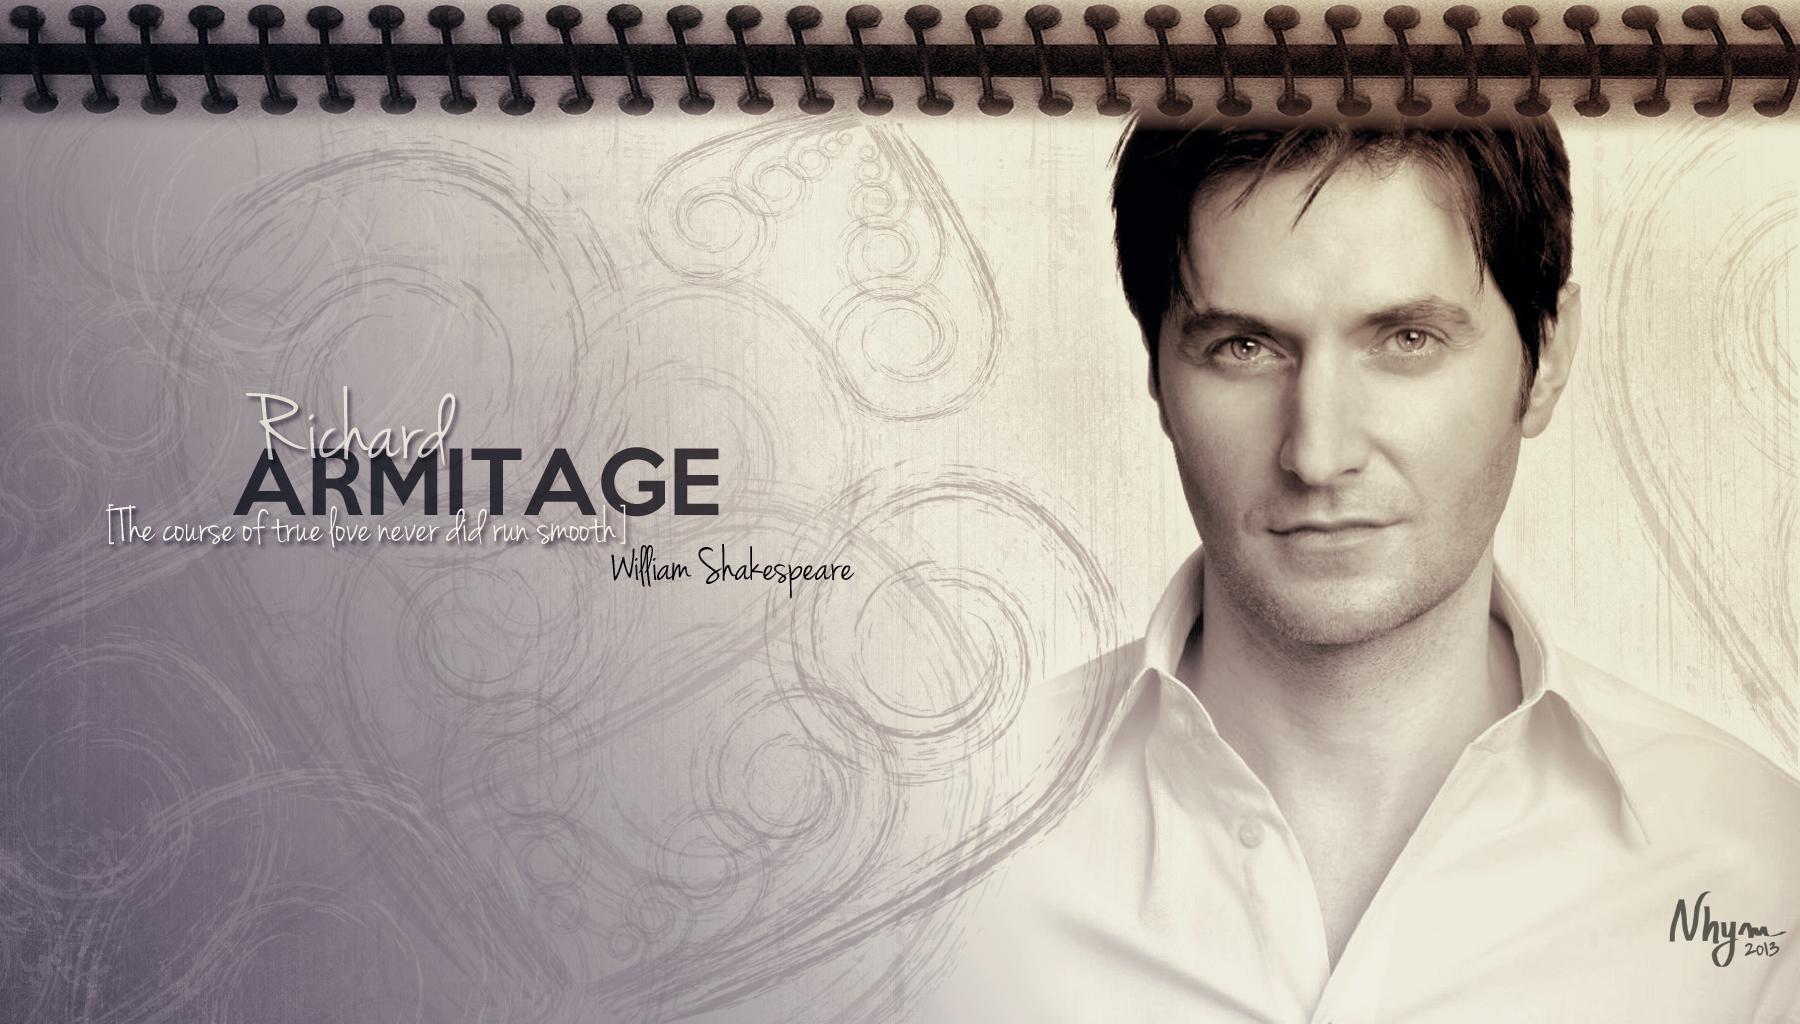 Richard Armitage Wallpaper   Richard Armitage Photo 33483144 1800x1024